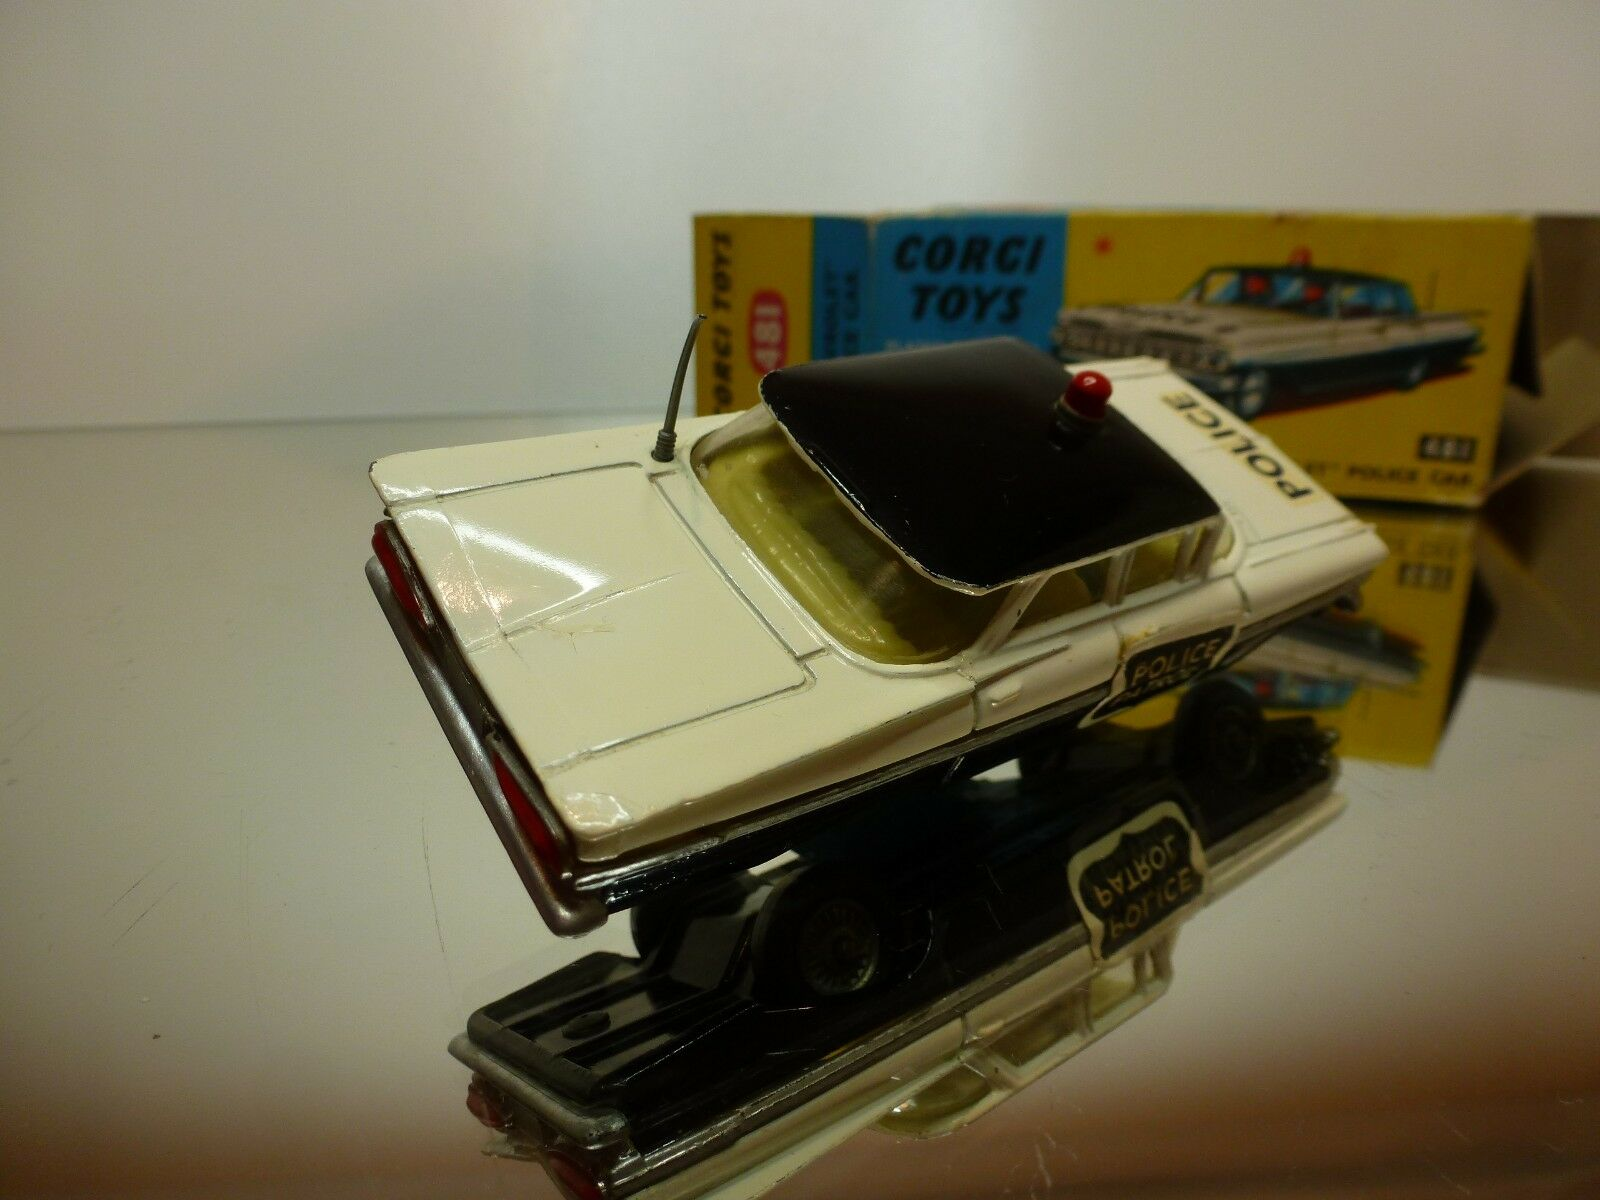 CORGI TOYS 481 CHEVROLET IMPALA POLICE - OFF OFF OFF blanco 1 43 RARE - GOOD IN BOX 5804c4